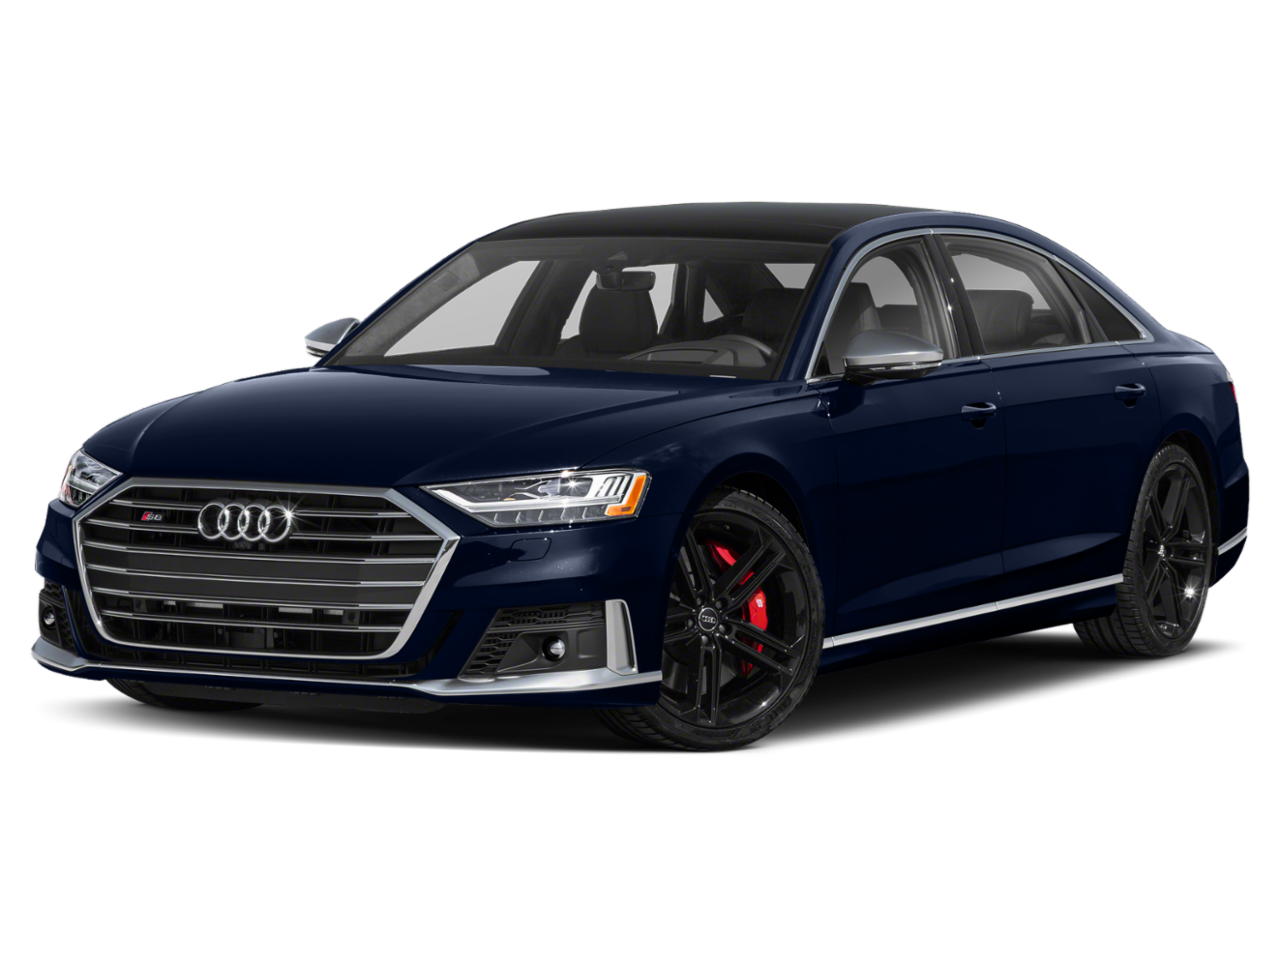 Audi 2021 S8 4.0 TFSI